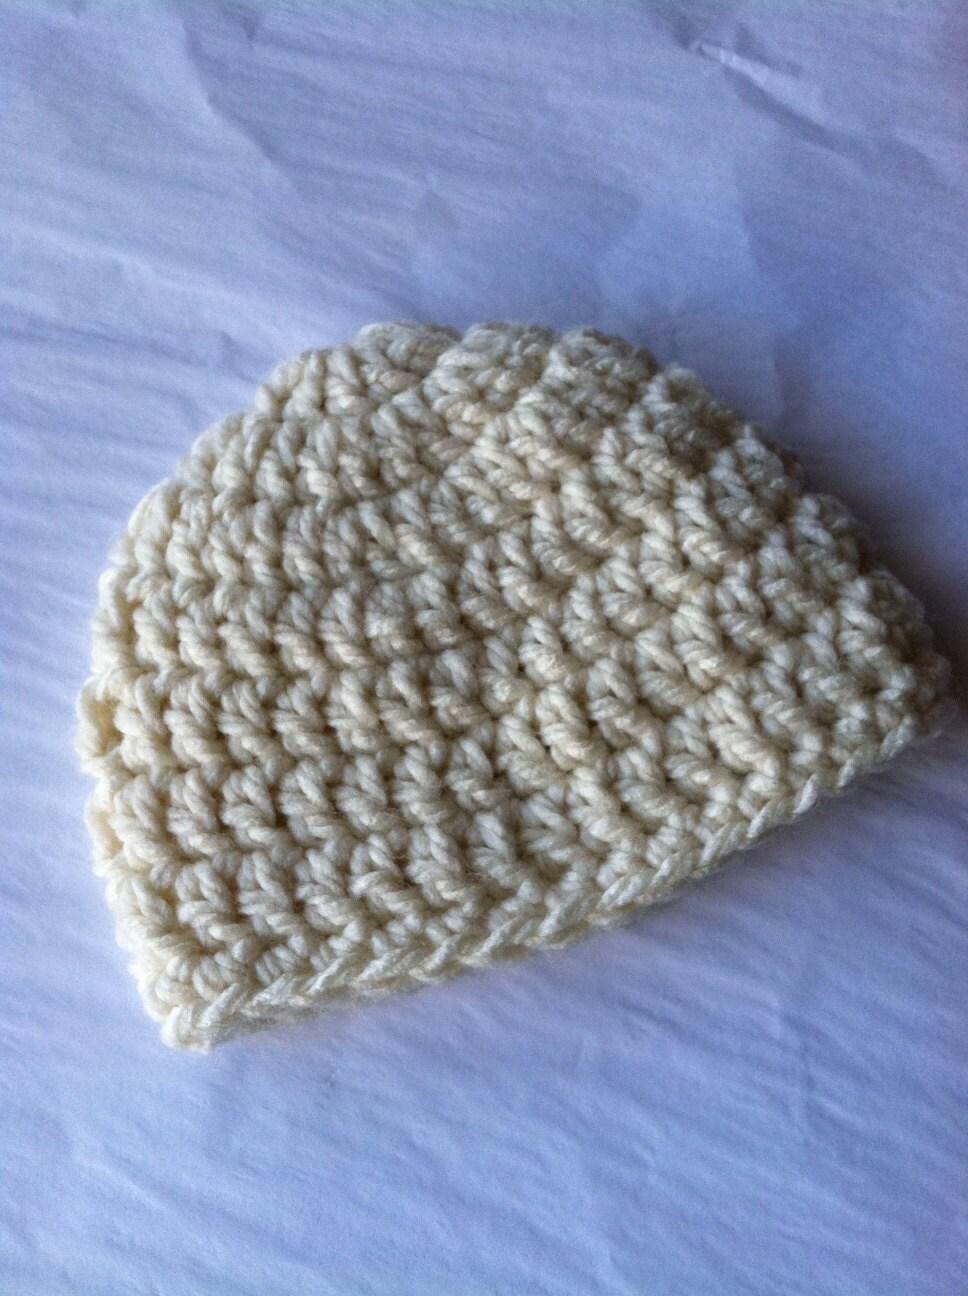 Newborn Crochet Hat Pattern Bulky Yarn : Items similar to Crochet Baby Hat in Bulky Cream Yarn ...